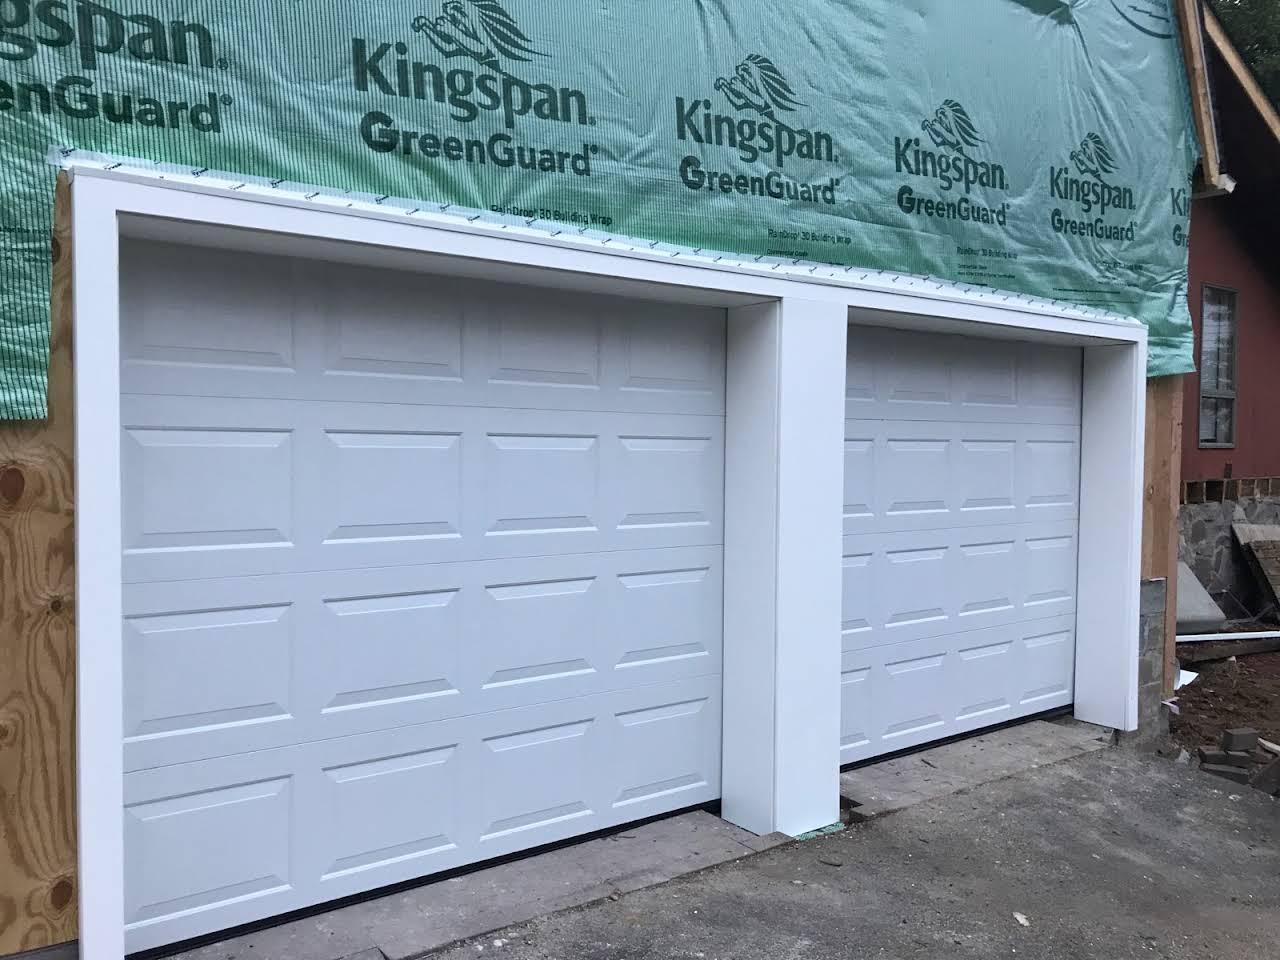 Above all garage door garage door install and repairs in and preventive maintenance special rubansaba